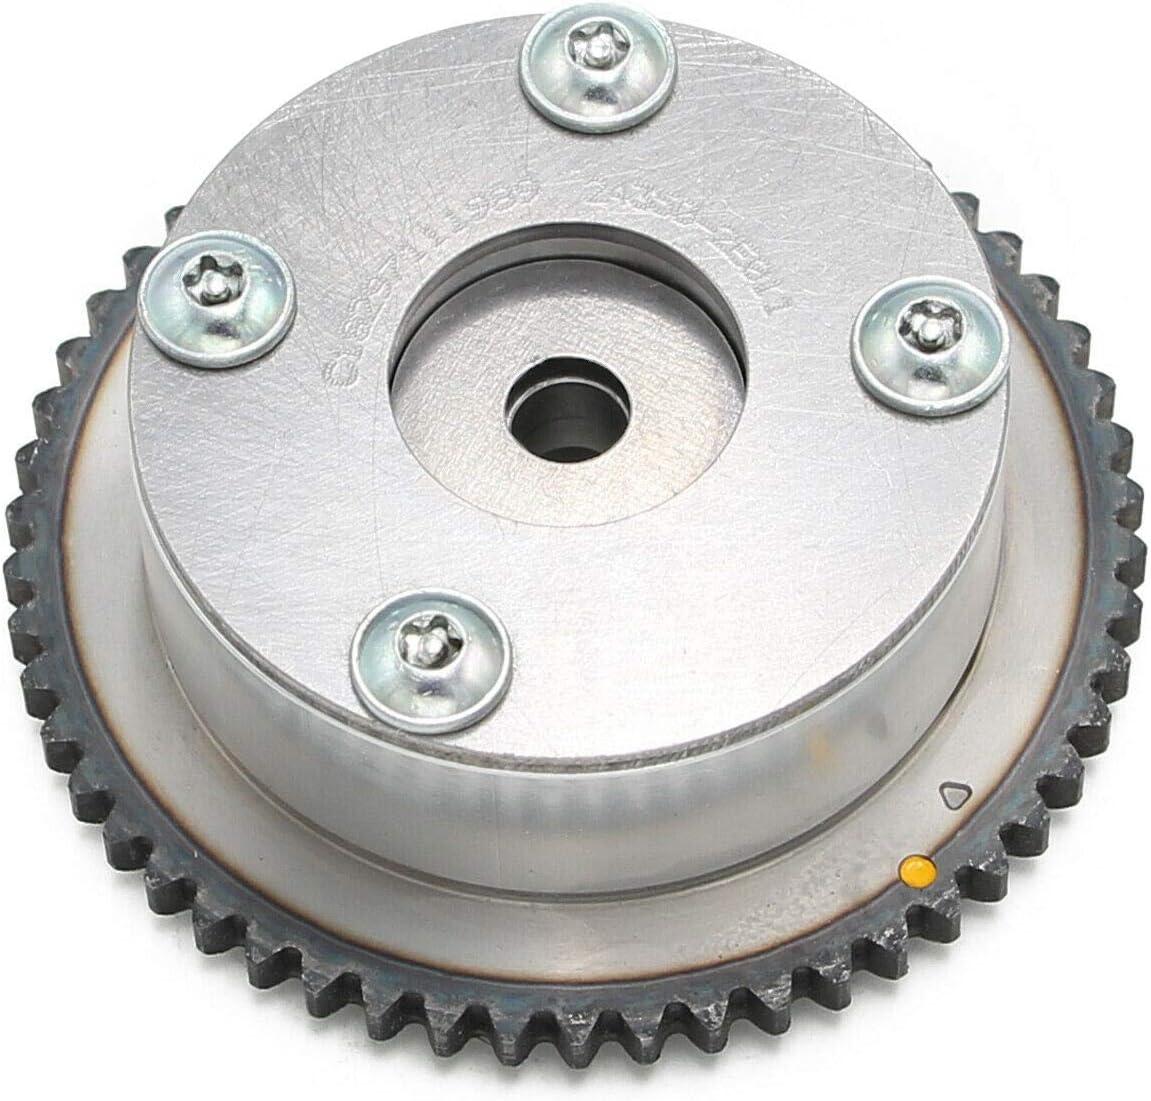 Timing Chain Kit Exhaust Intake VVT Gear fits KIA FORTE KOUP OPTIMA RIO 1.6L